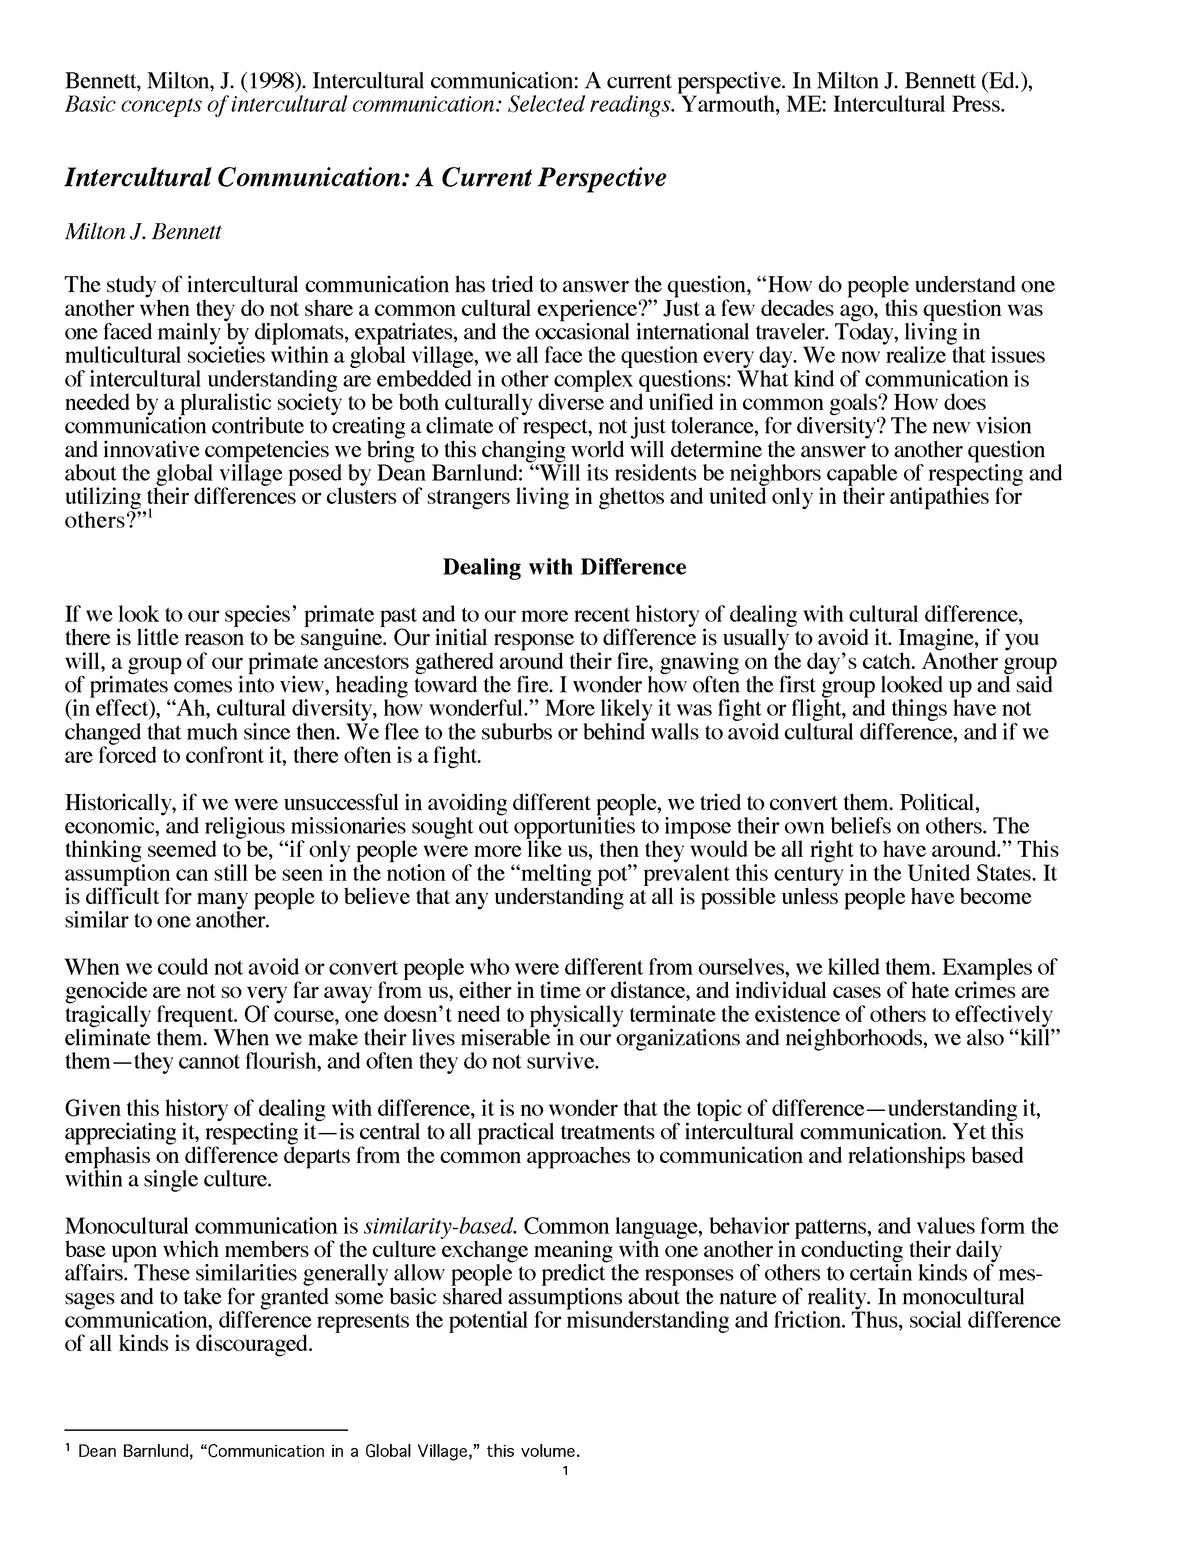 Bennett, Basic Concepts of intercultural communication